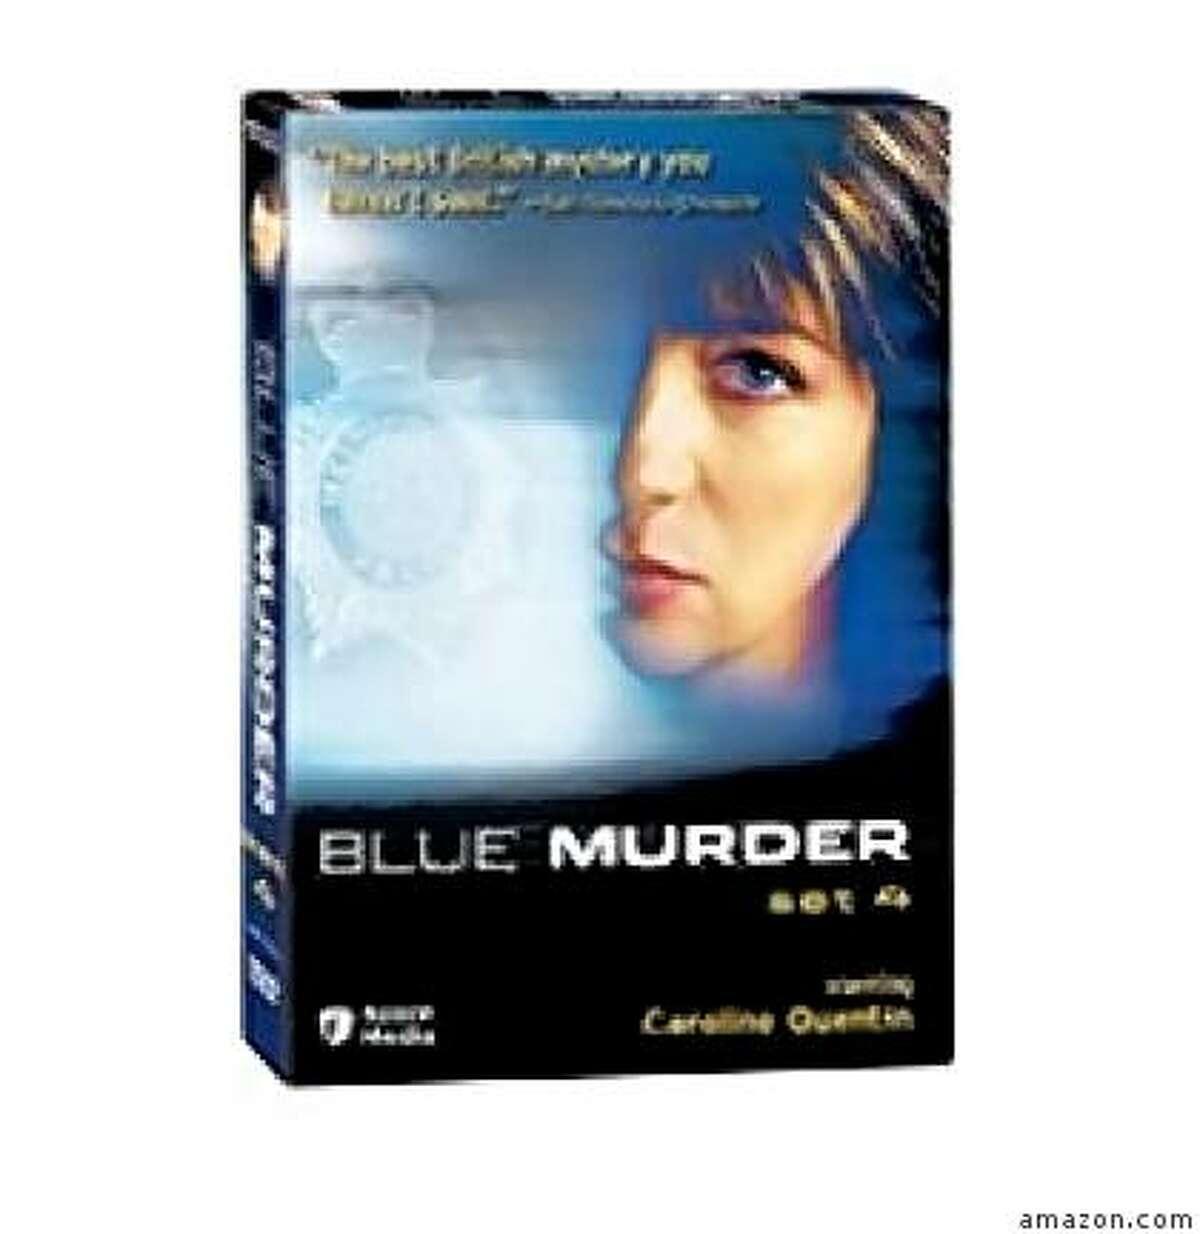 dvd cover: BLUE MURDER: SET 4